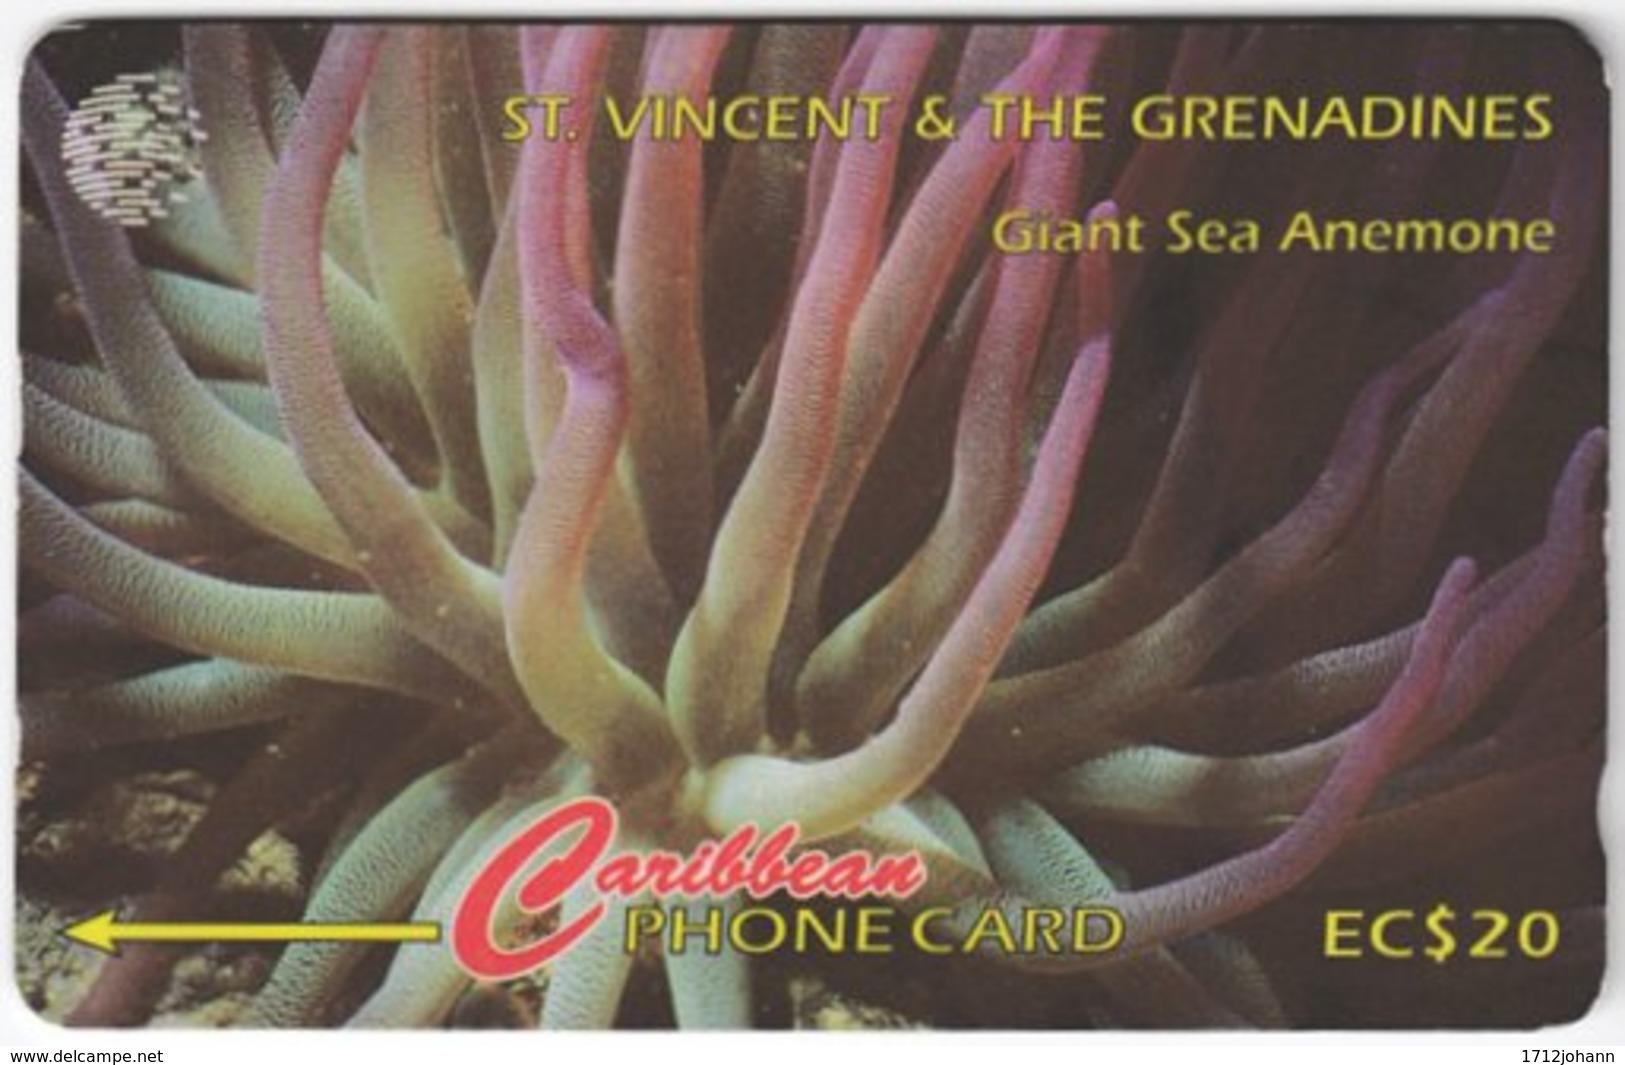 ST. VINCENT & GRENADINES A-065 Magnetic Cable & Wireless - Animal, Sea Life, Anemone - 101CSVB - Used - San Vicente Y Las Granadinas